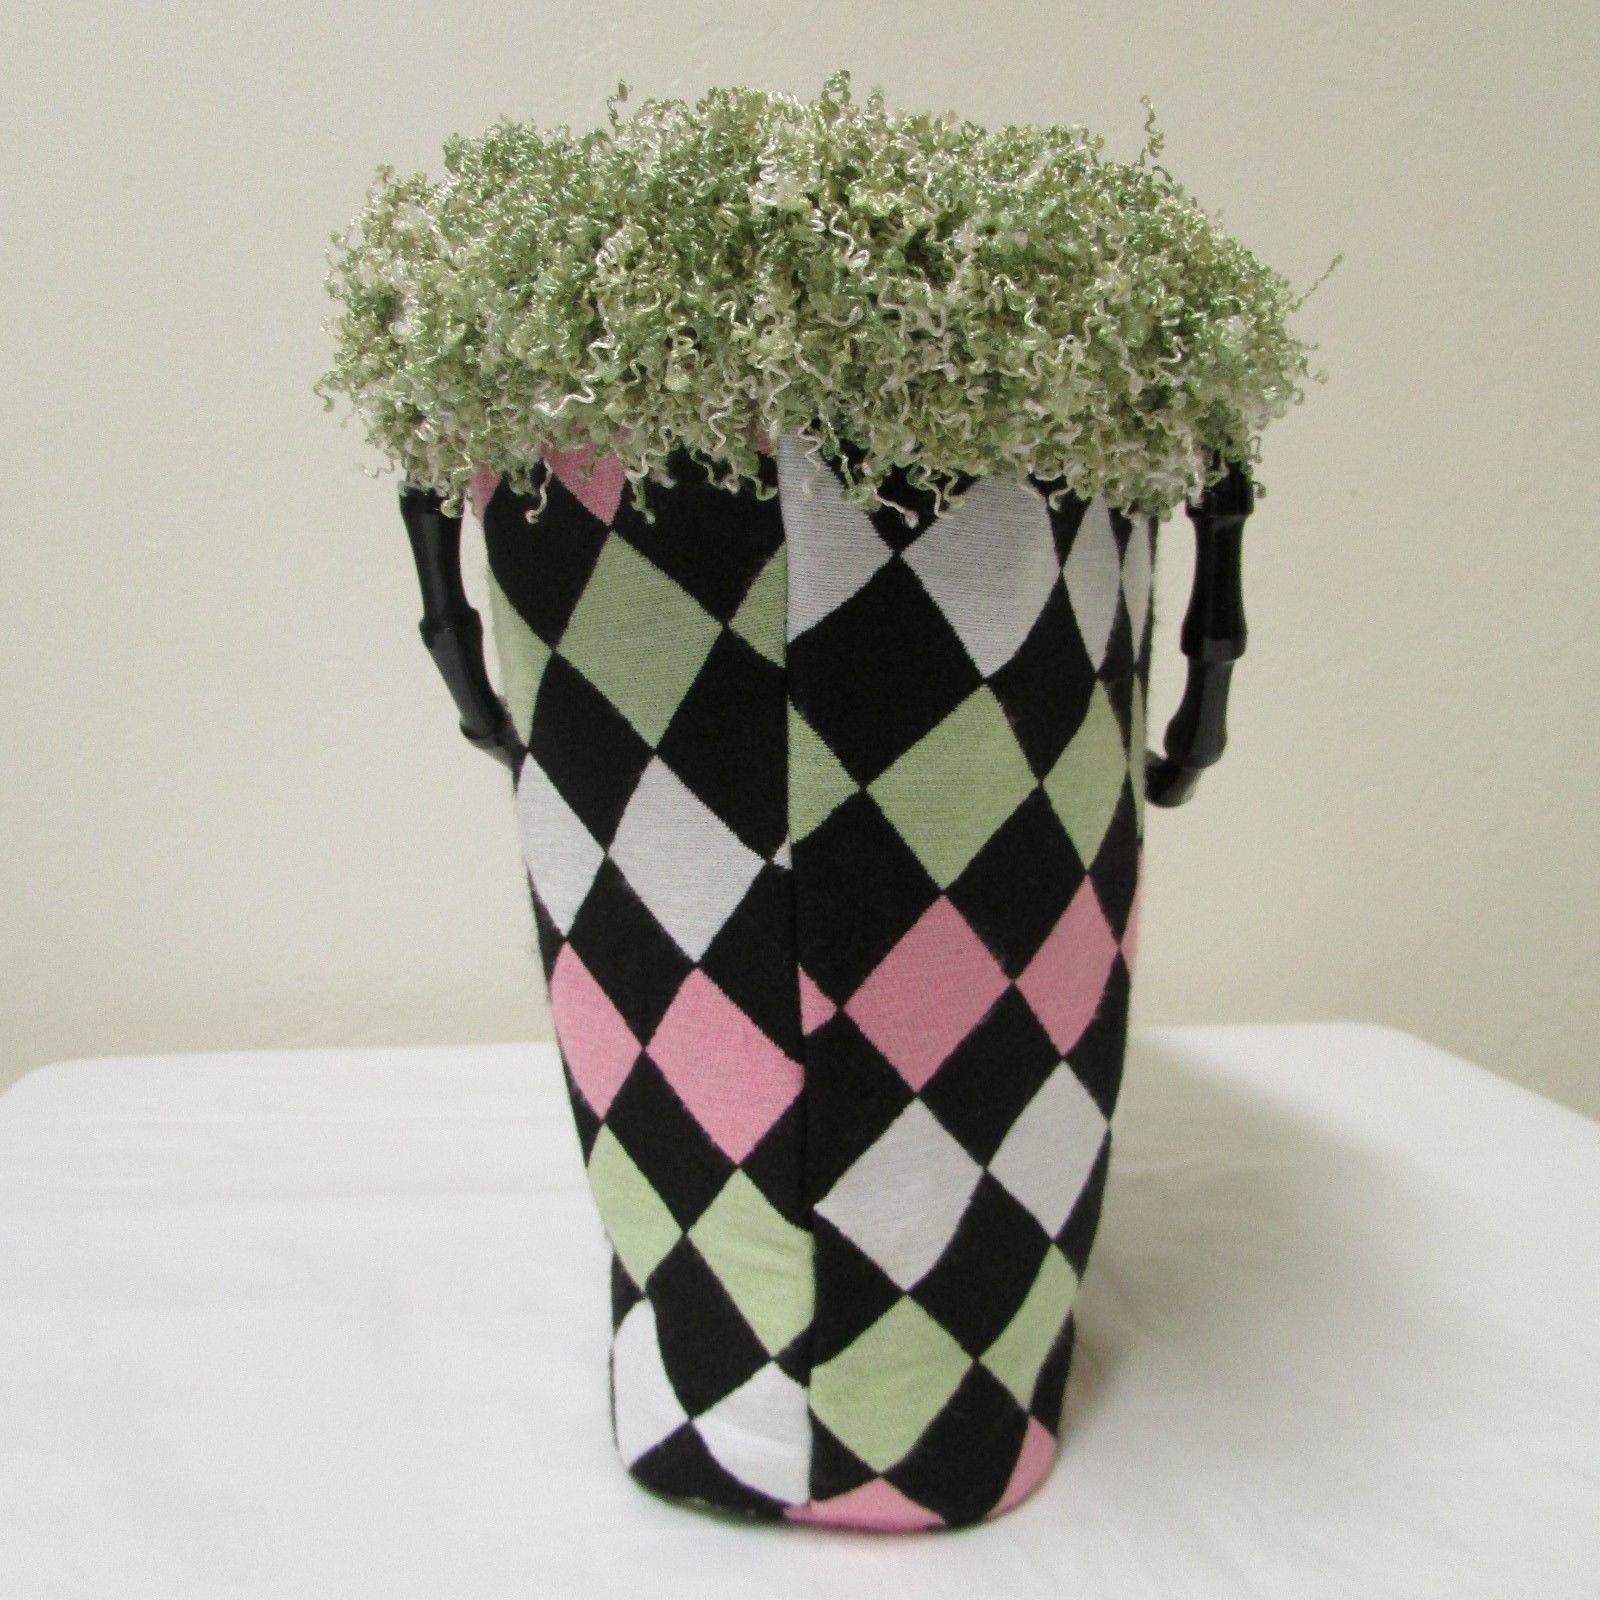 NWOT Bag Daddy Fabric Lime Green Pink Black Handbag Black Bamboo Style Handles image 5